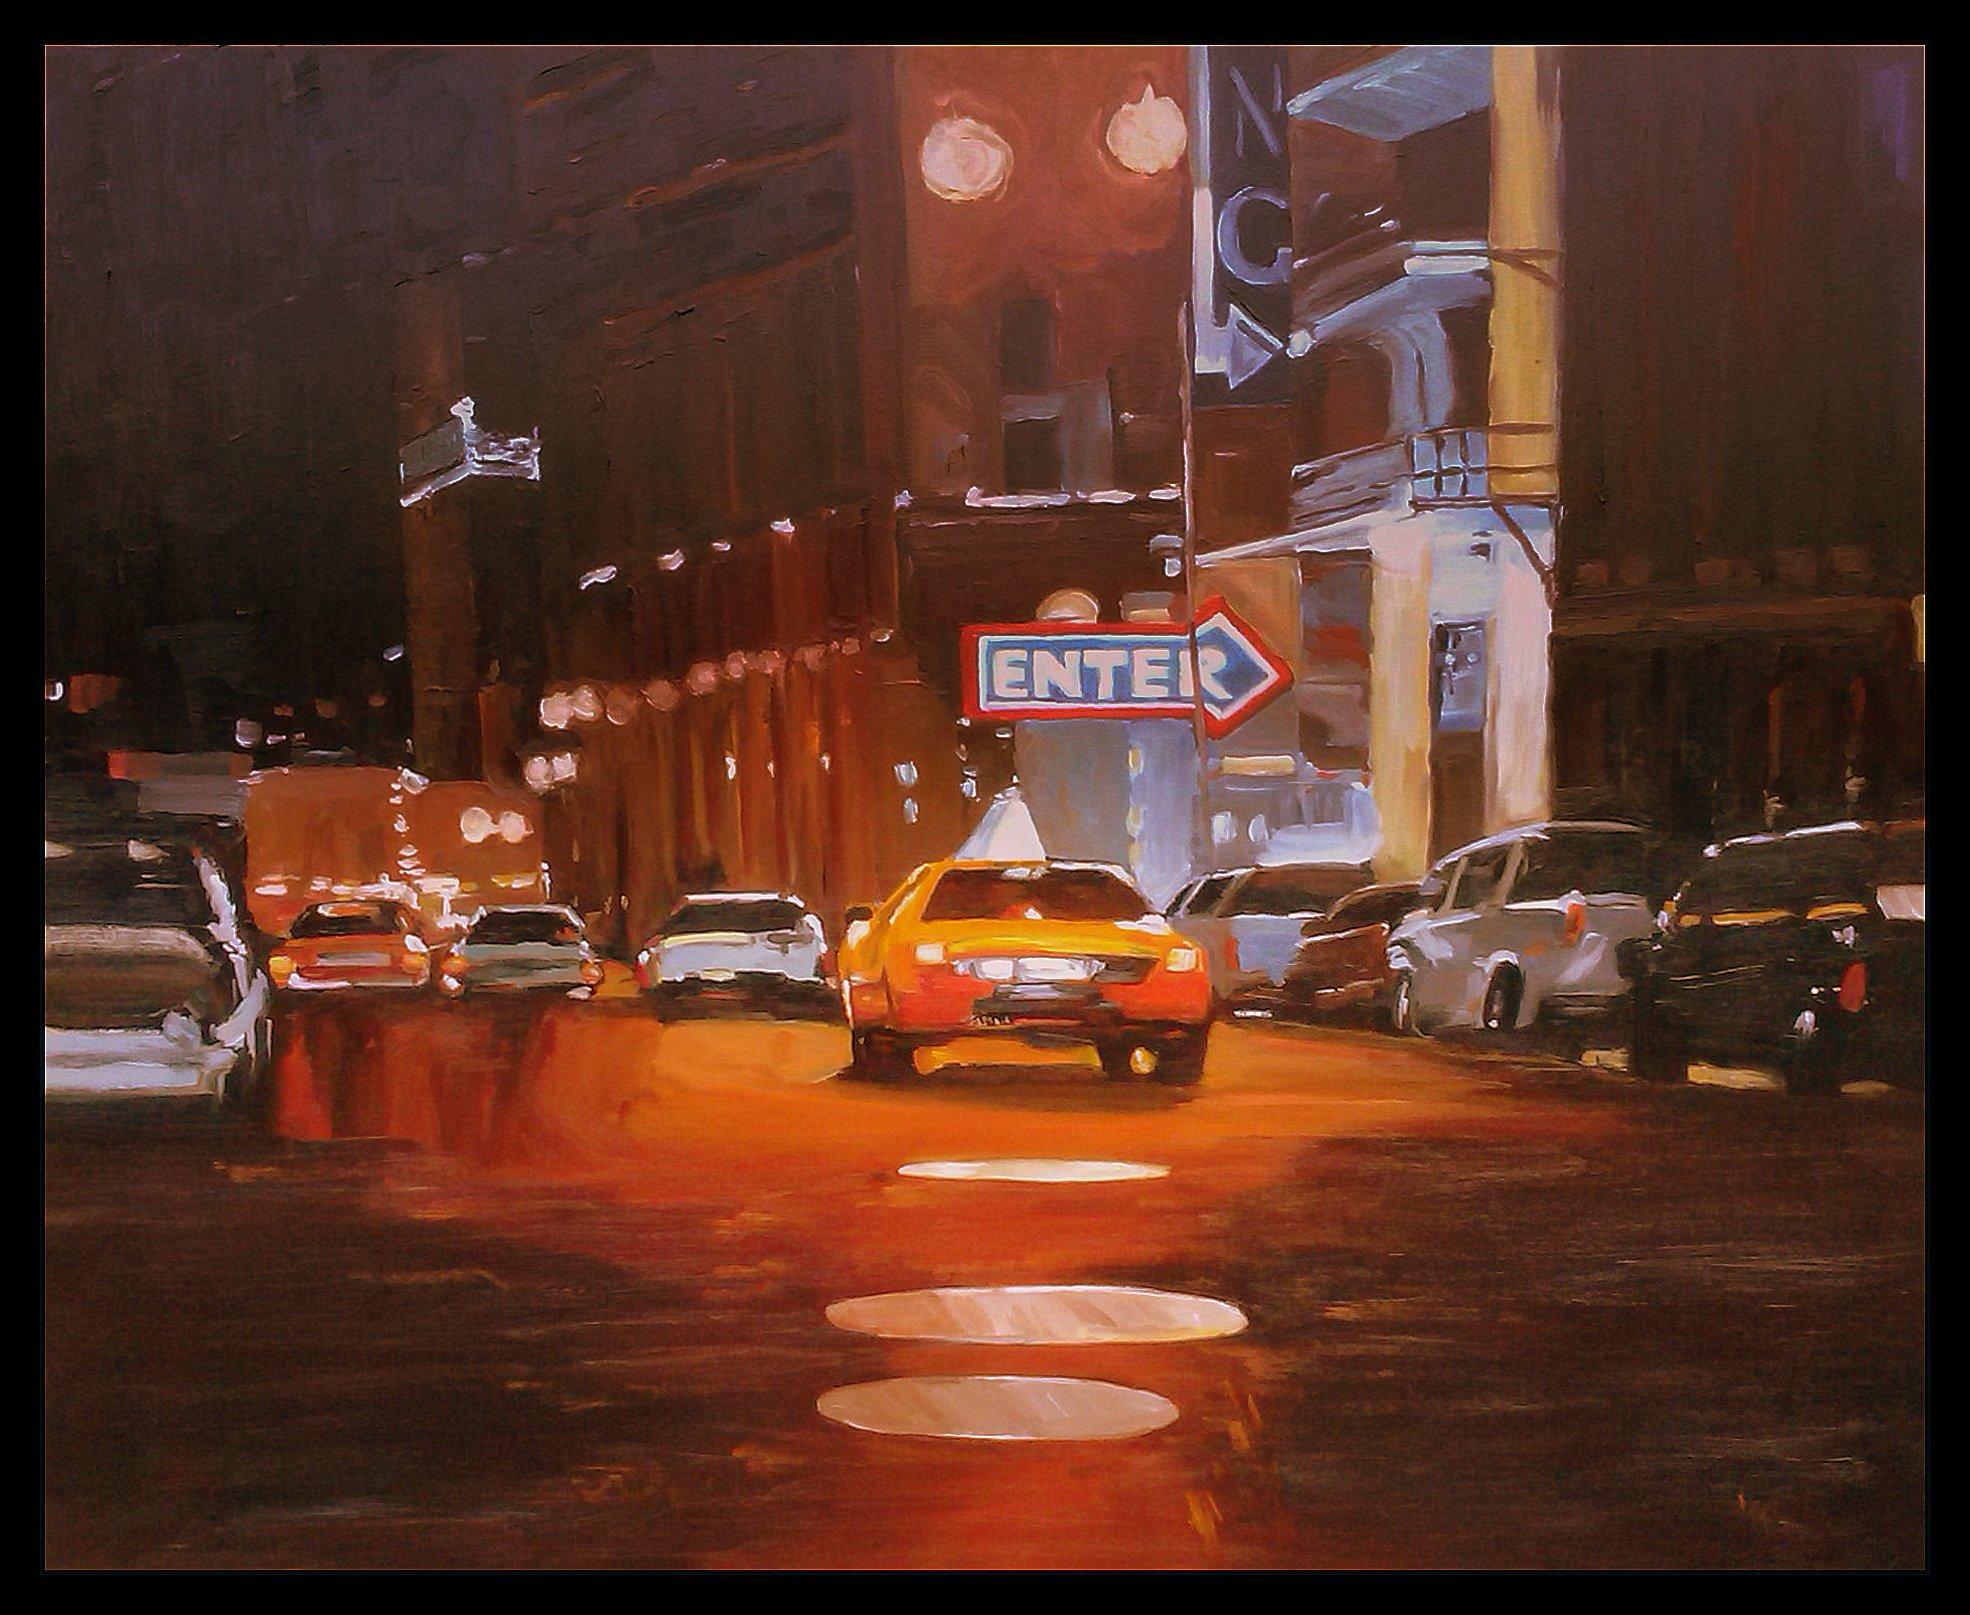 Cab in the night